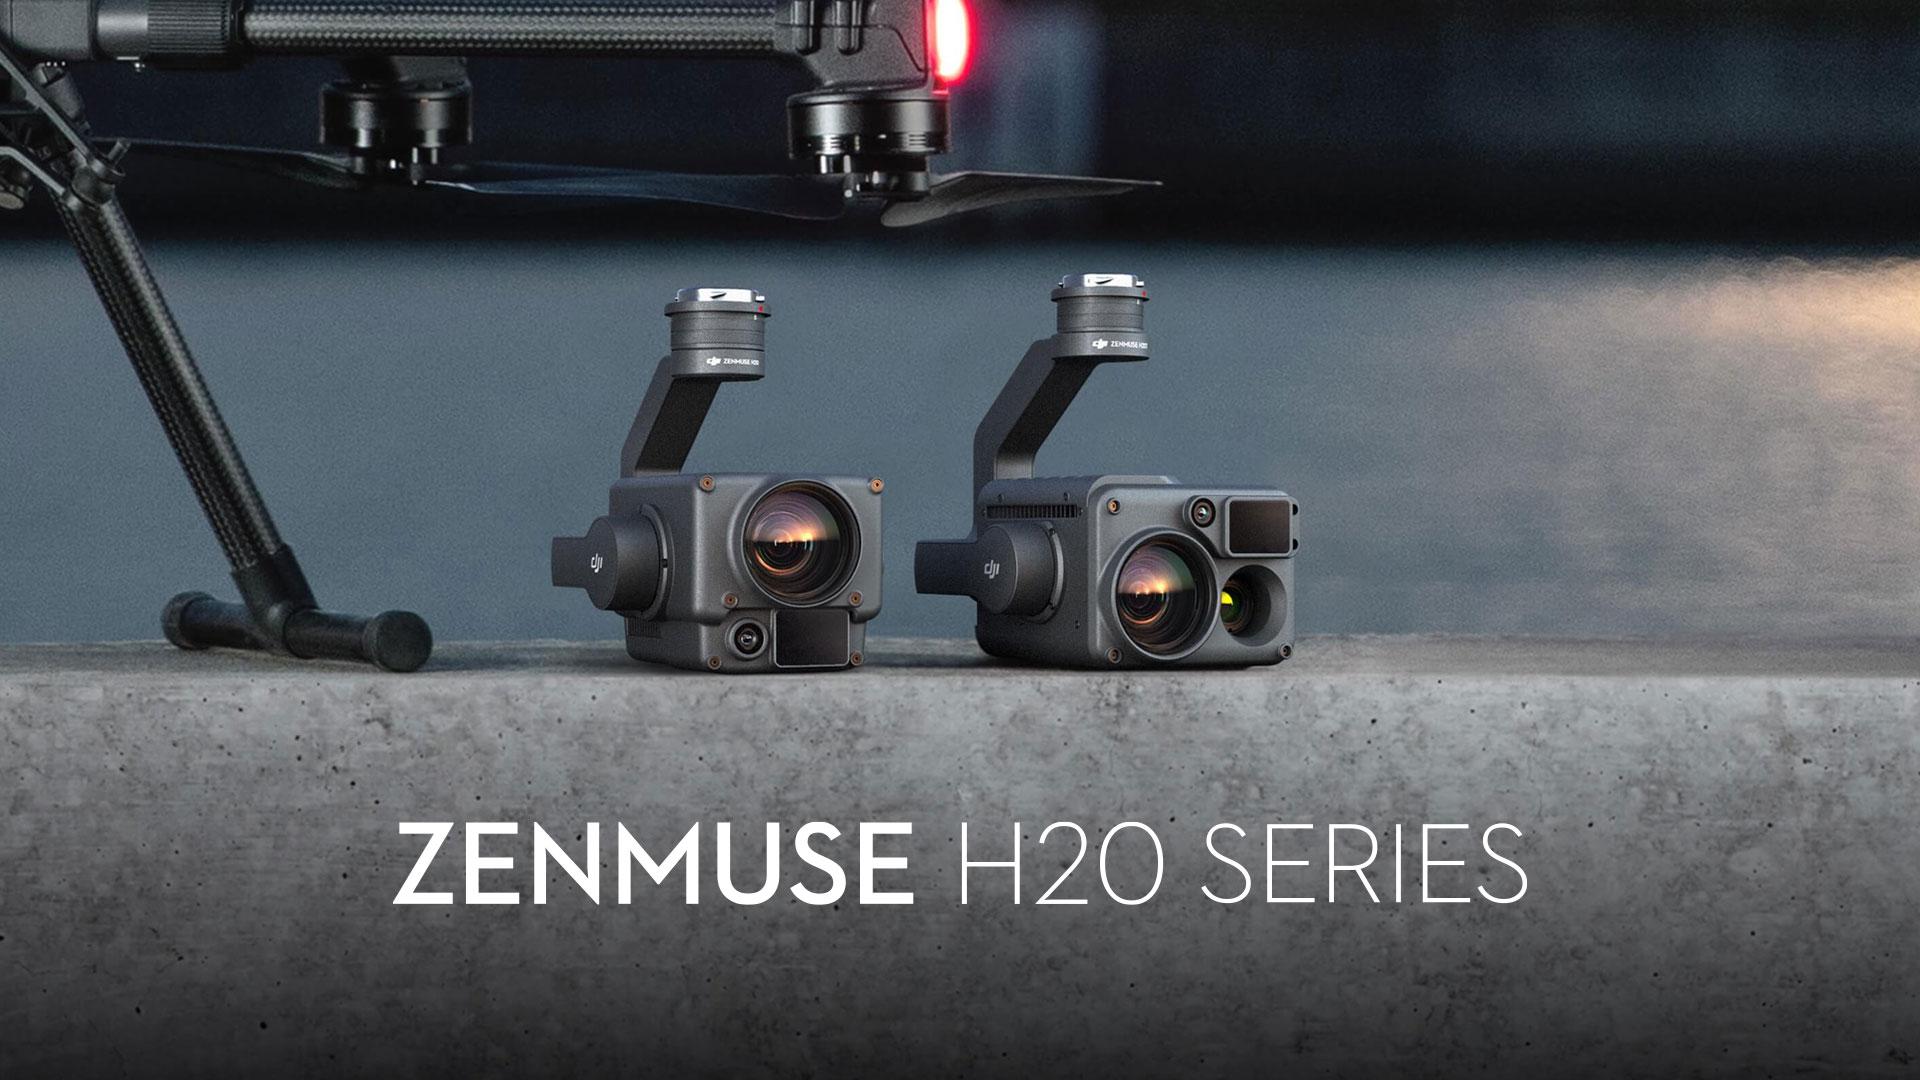 DJI Zenmuse H20